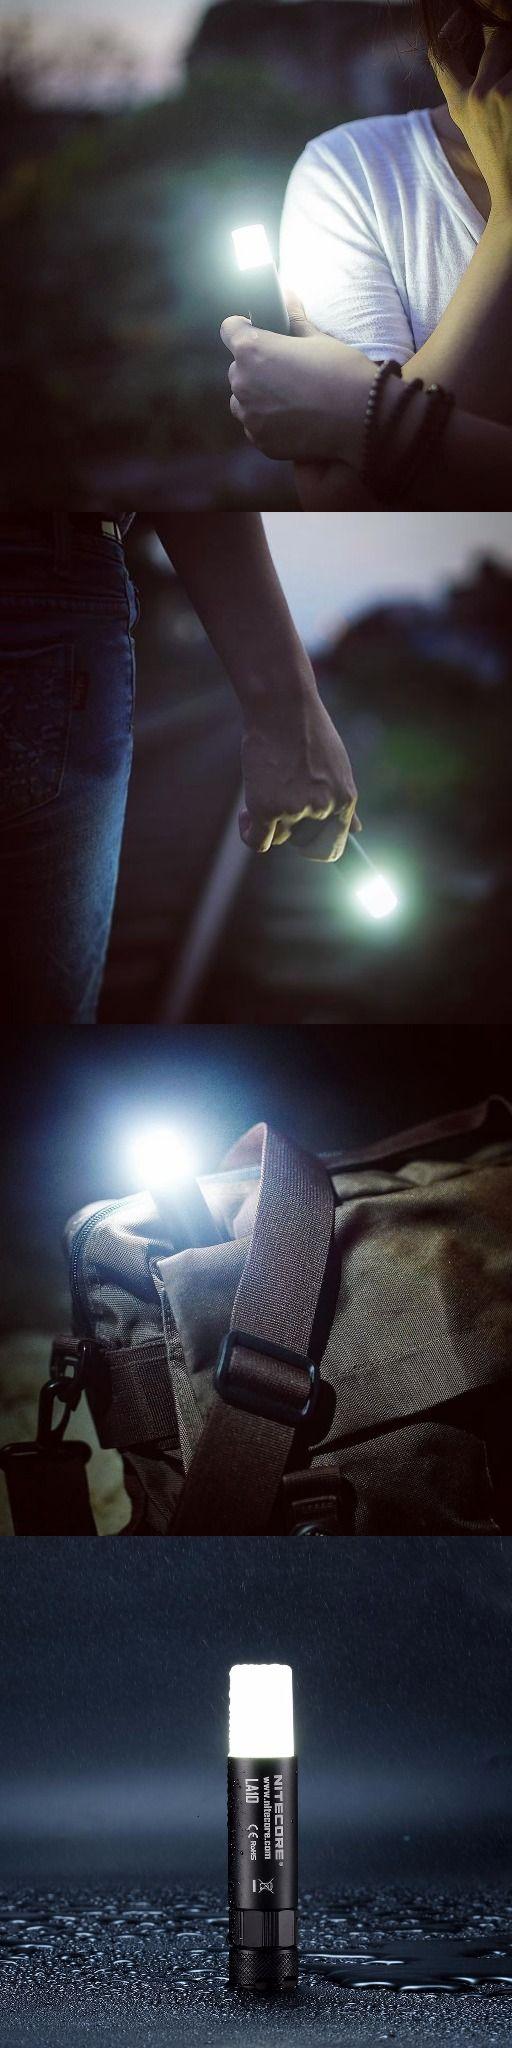 Nitecore LA10 135 Lumen Mini LED Camping Lantern Flashlight- Compact Lightweight including AA Battery and LumenTac Battery Organizer - Everyday Carry Gear